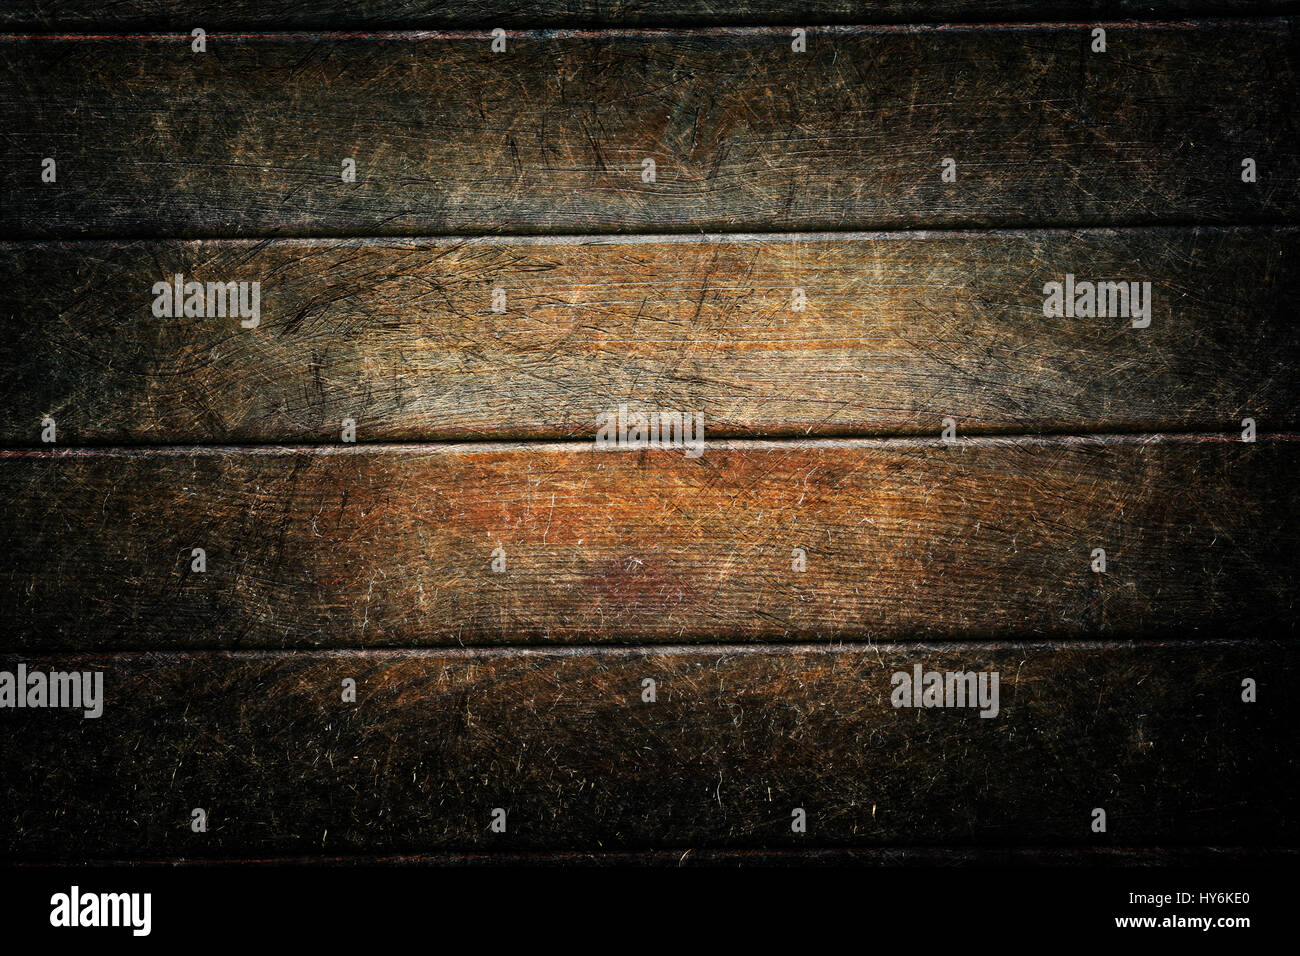 Hintergrund Holz Braun Grau Grunge With Holz Grau